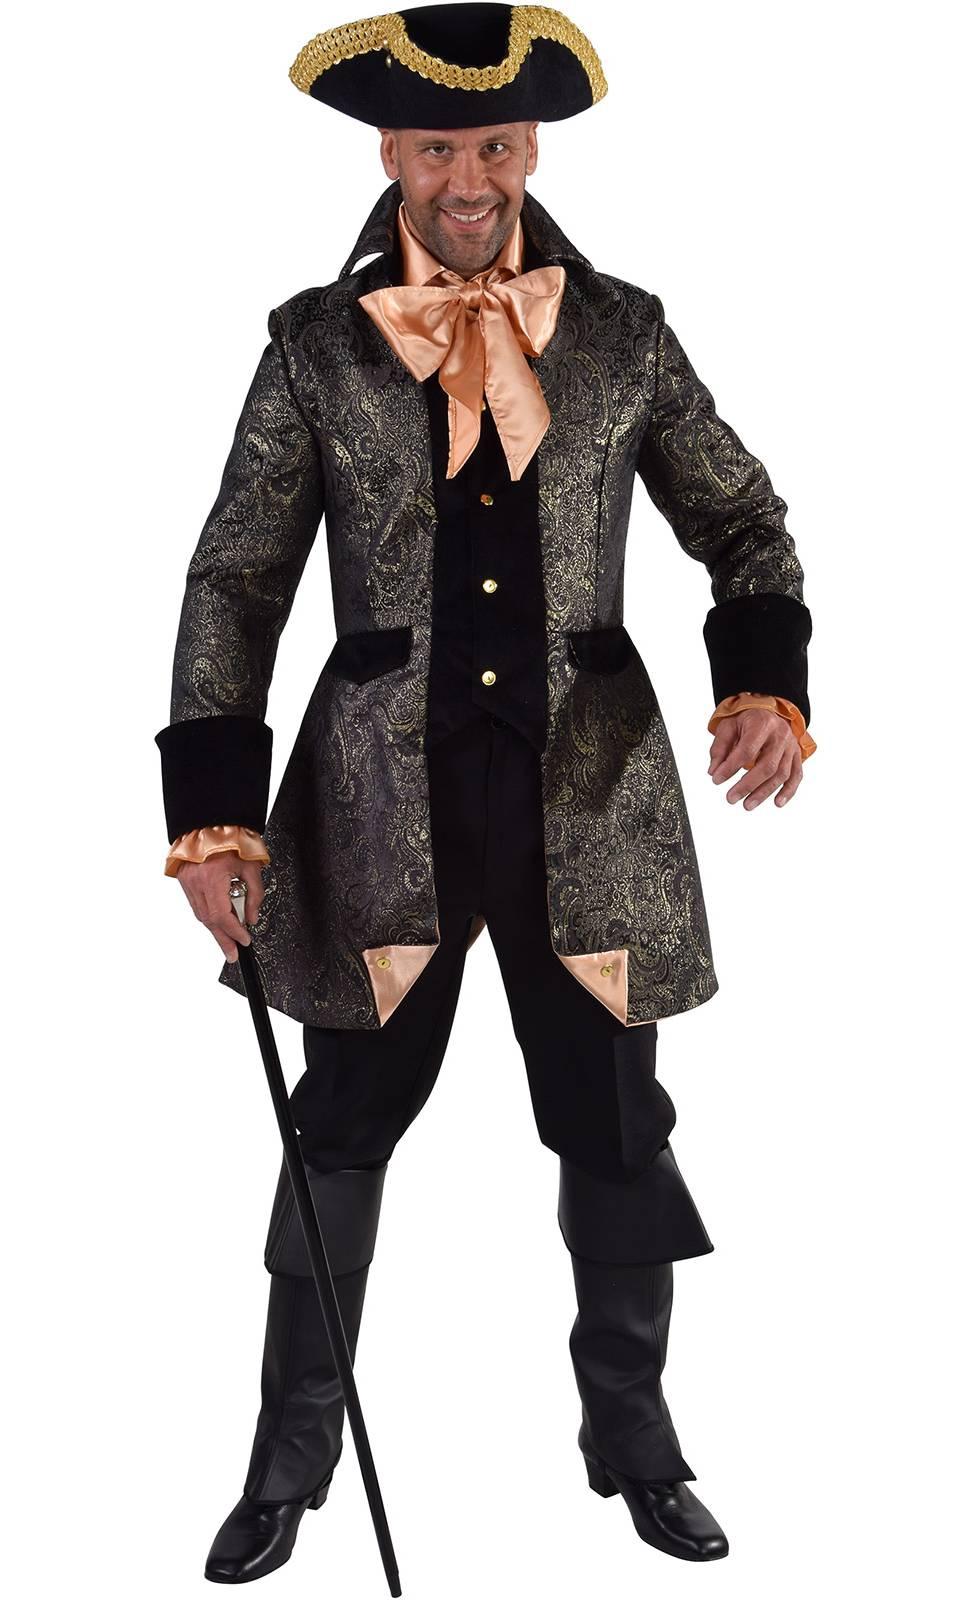 Costume marquis noir et or grande taille